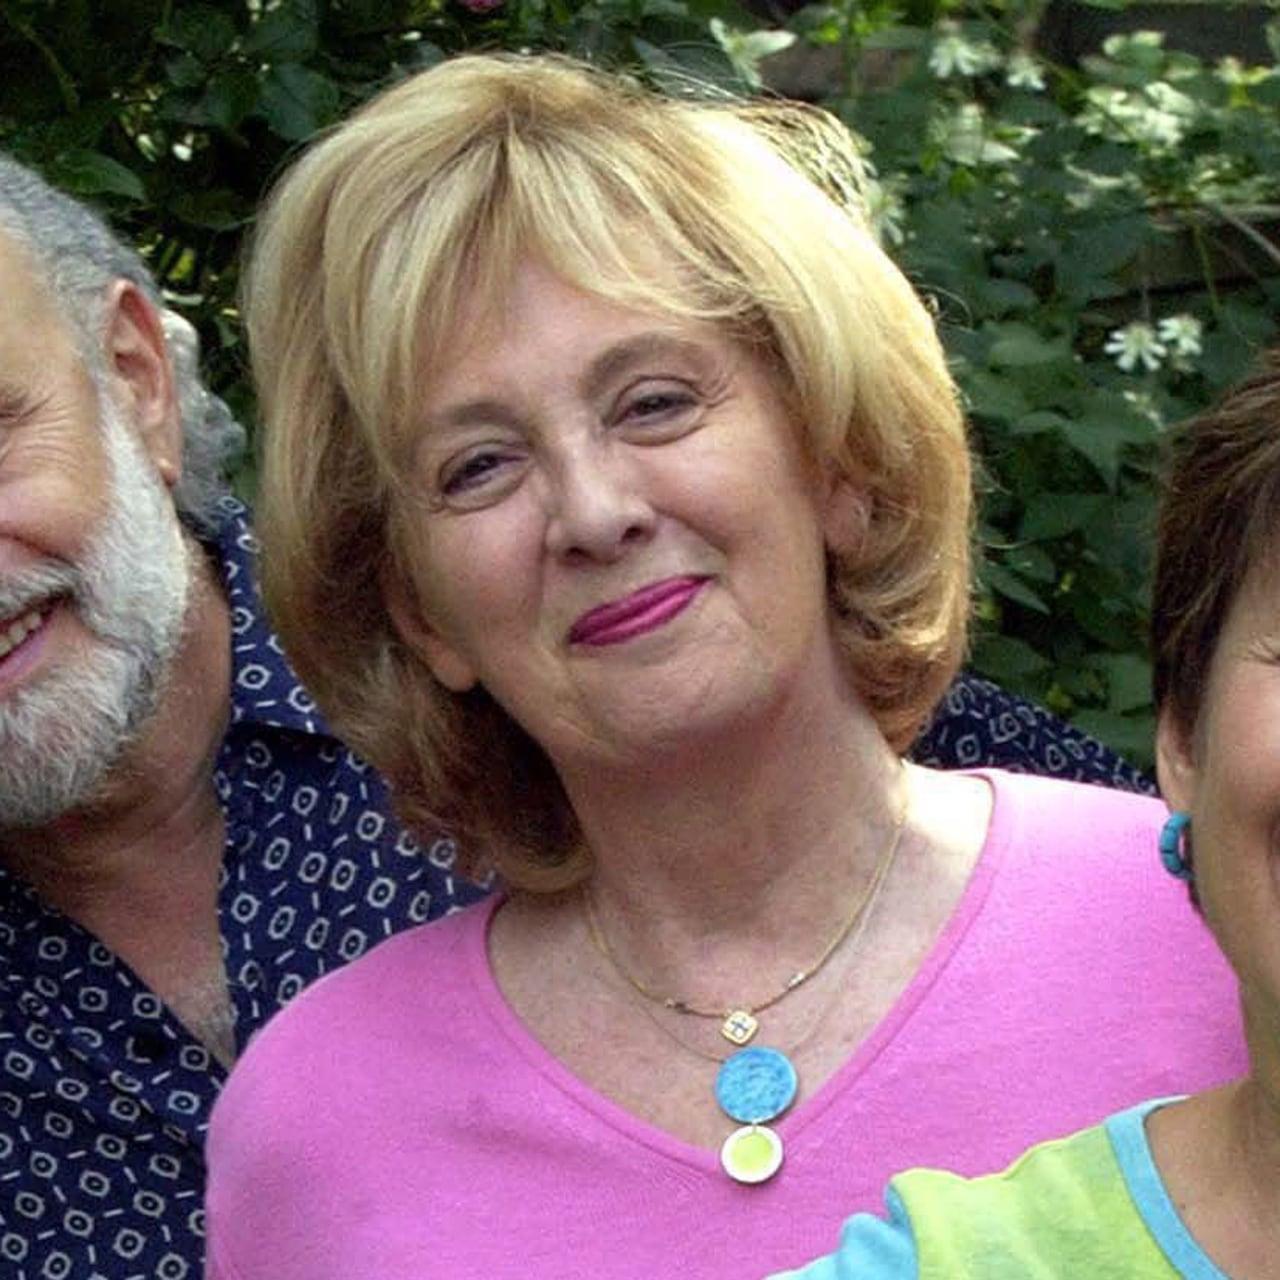 Lois Lilienstein, of Sharon, Lois & Bram and Skinnamarink